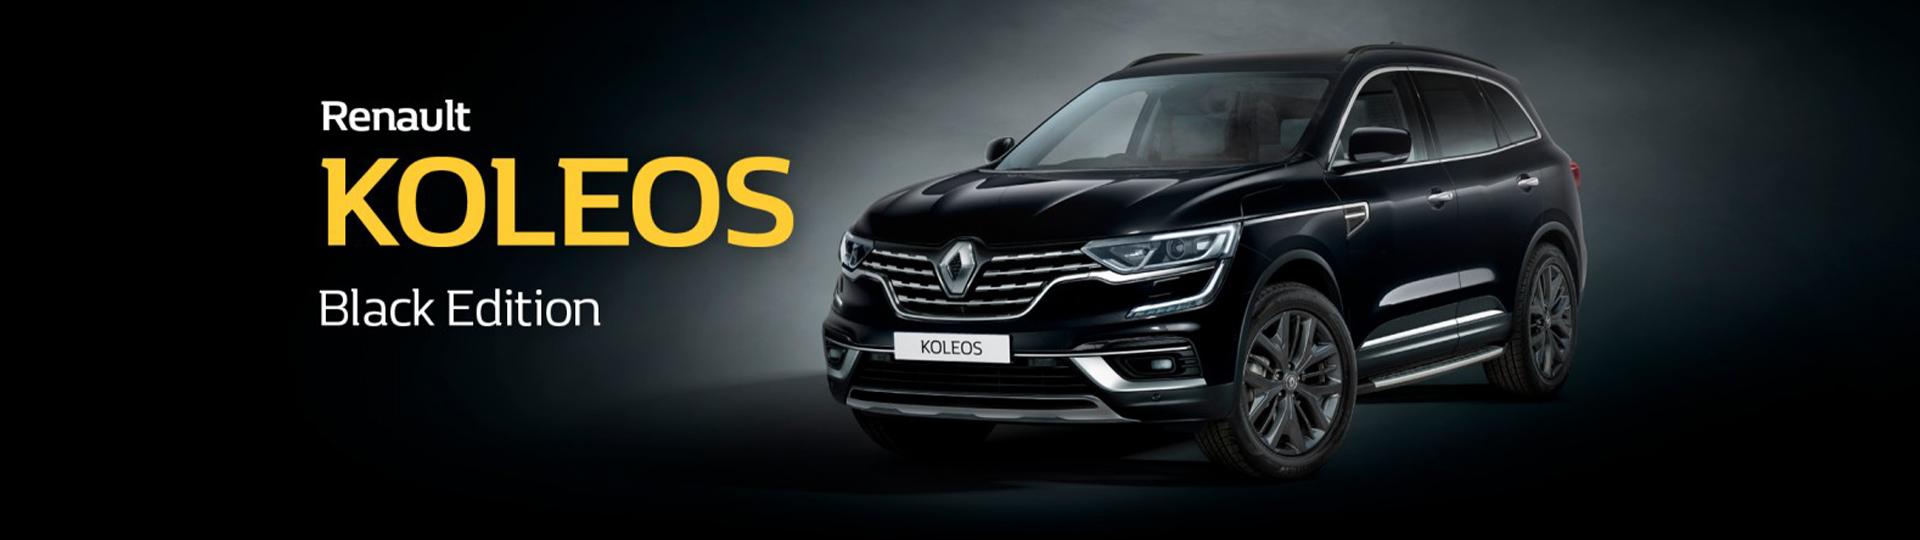 Renault Koleos Black Edition